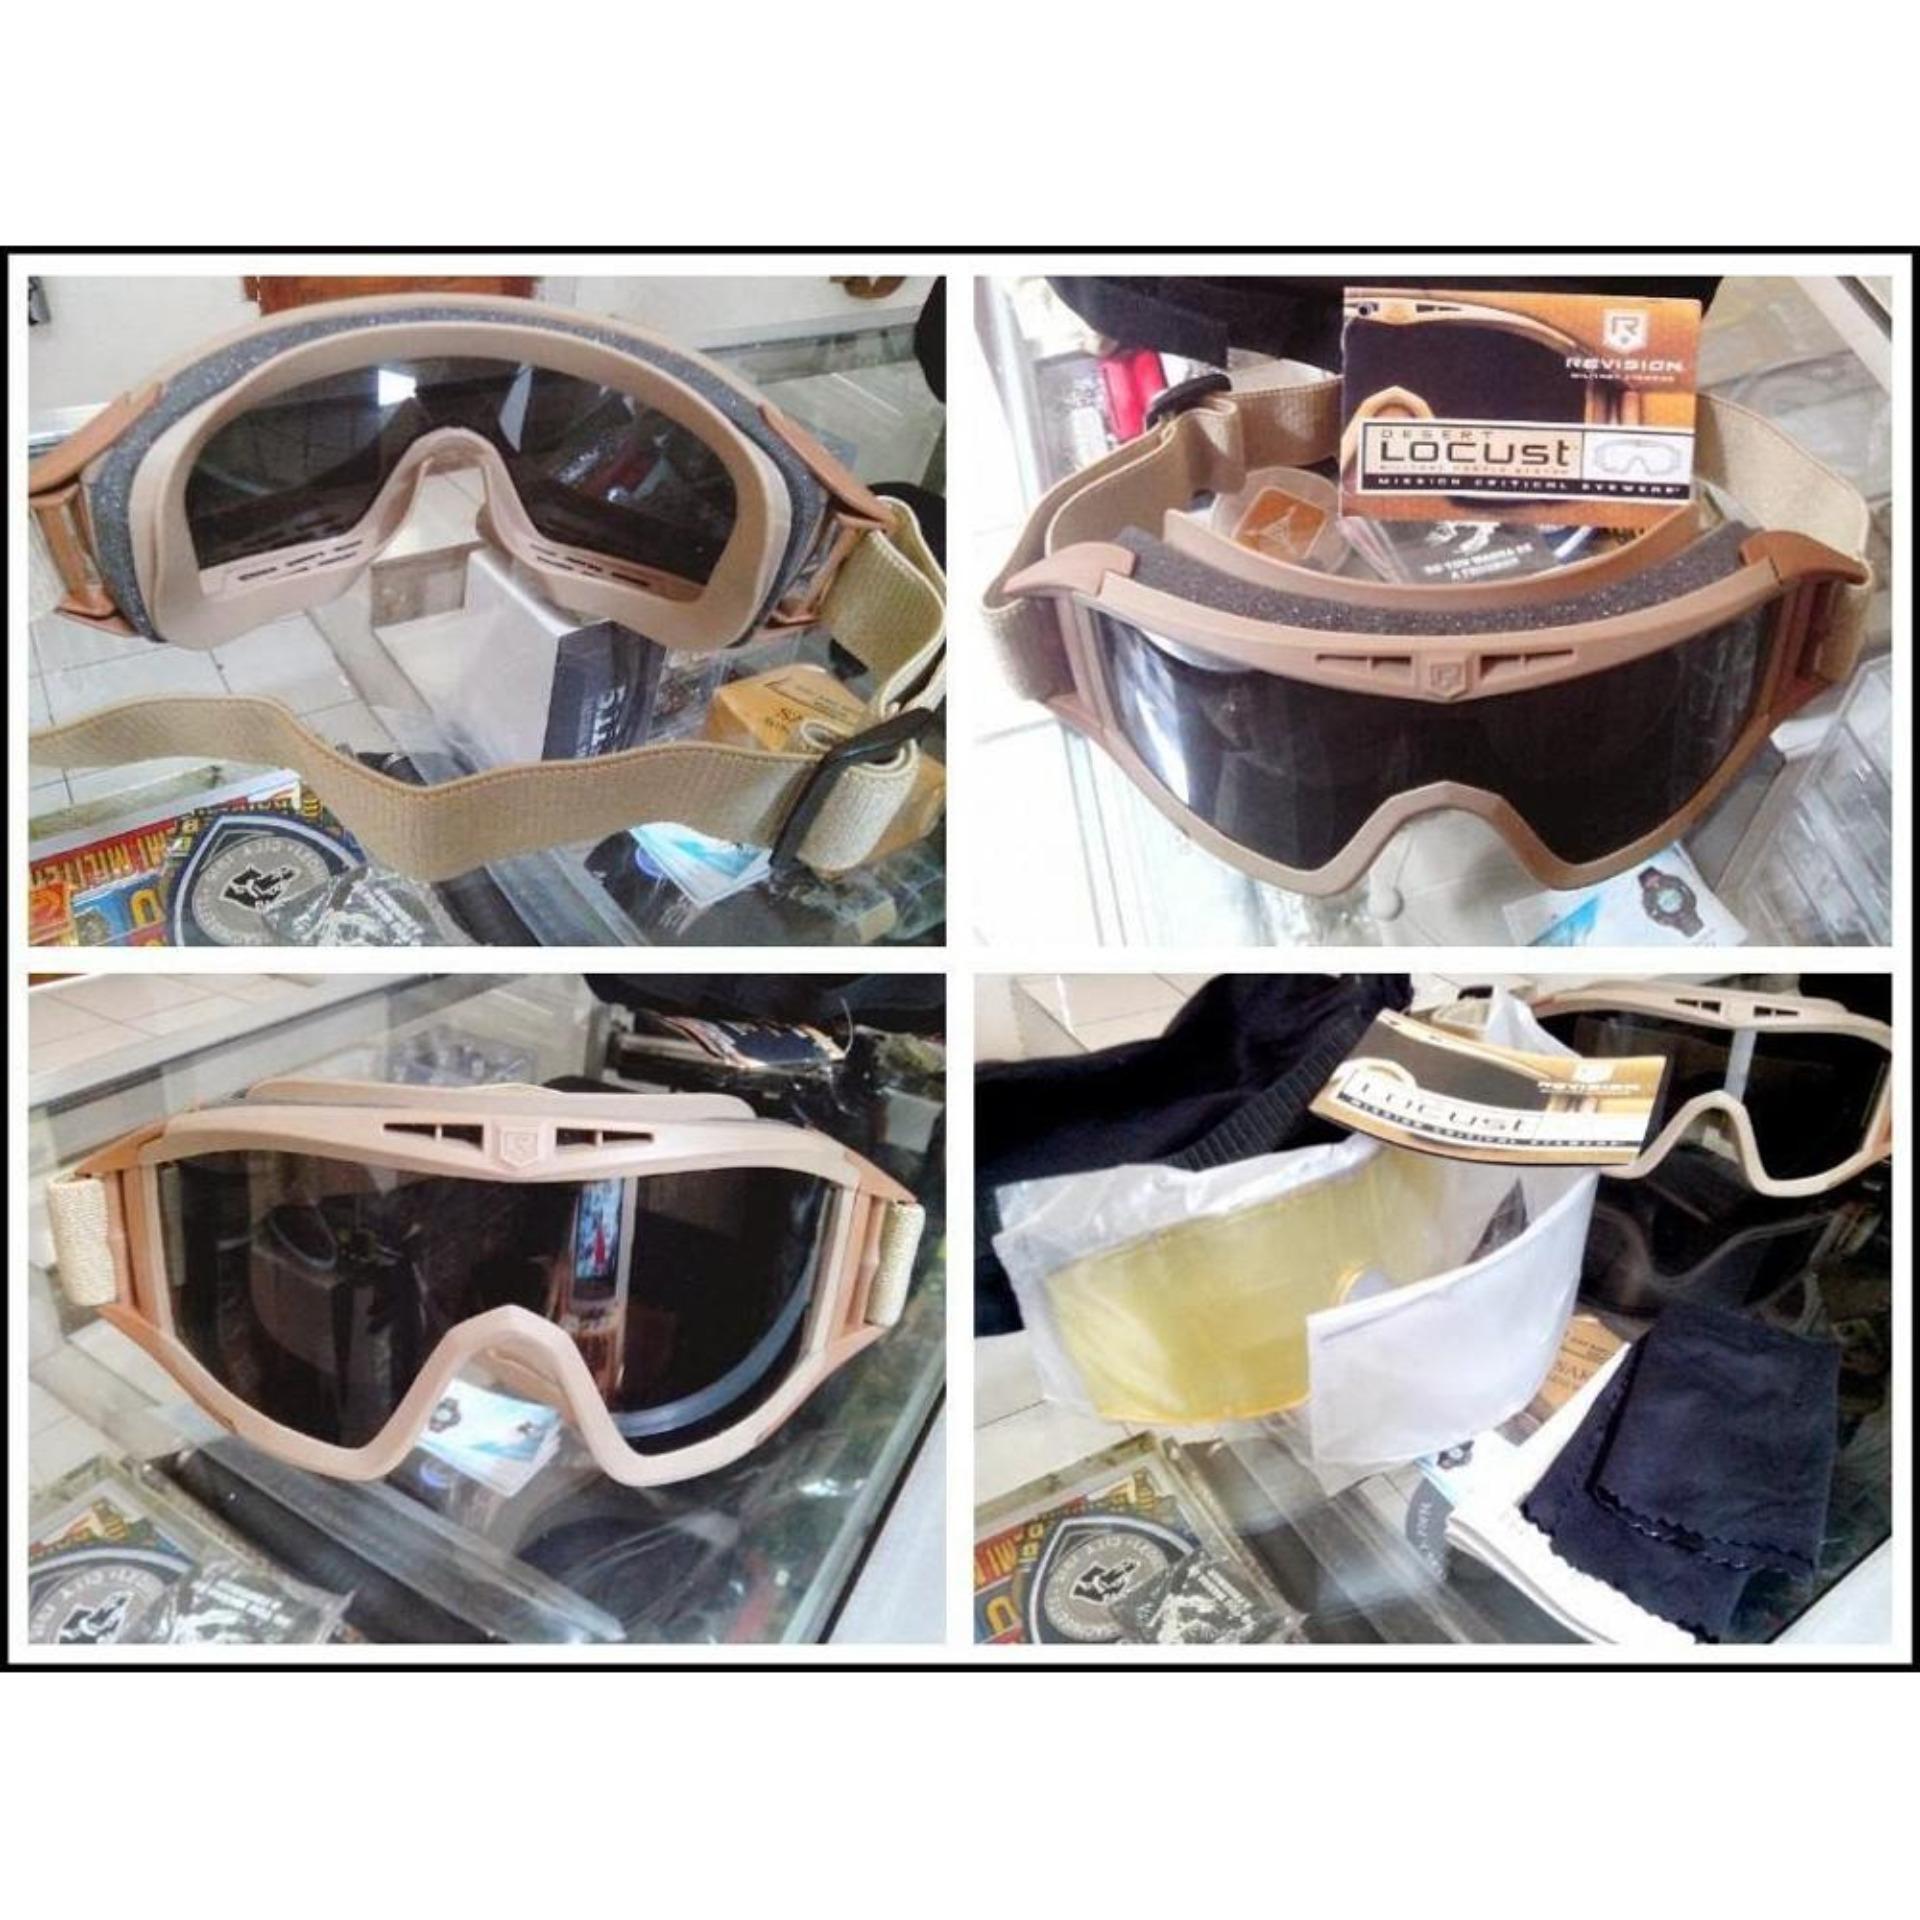 Kacamata Gurun 3 Lensa / Google Locust Desert USA (untuk airsoft /sepeda motor .